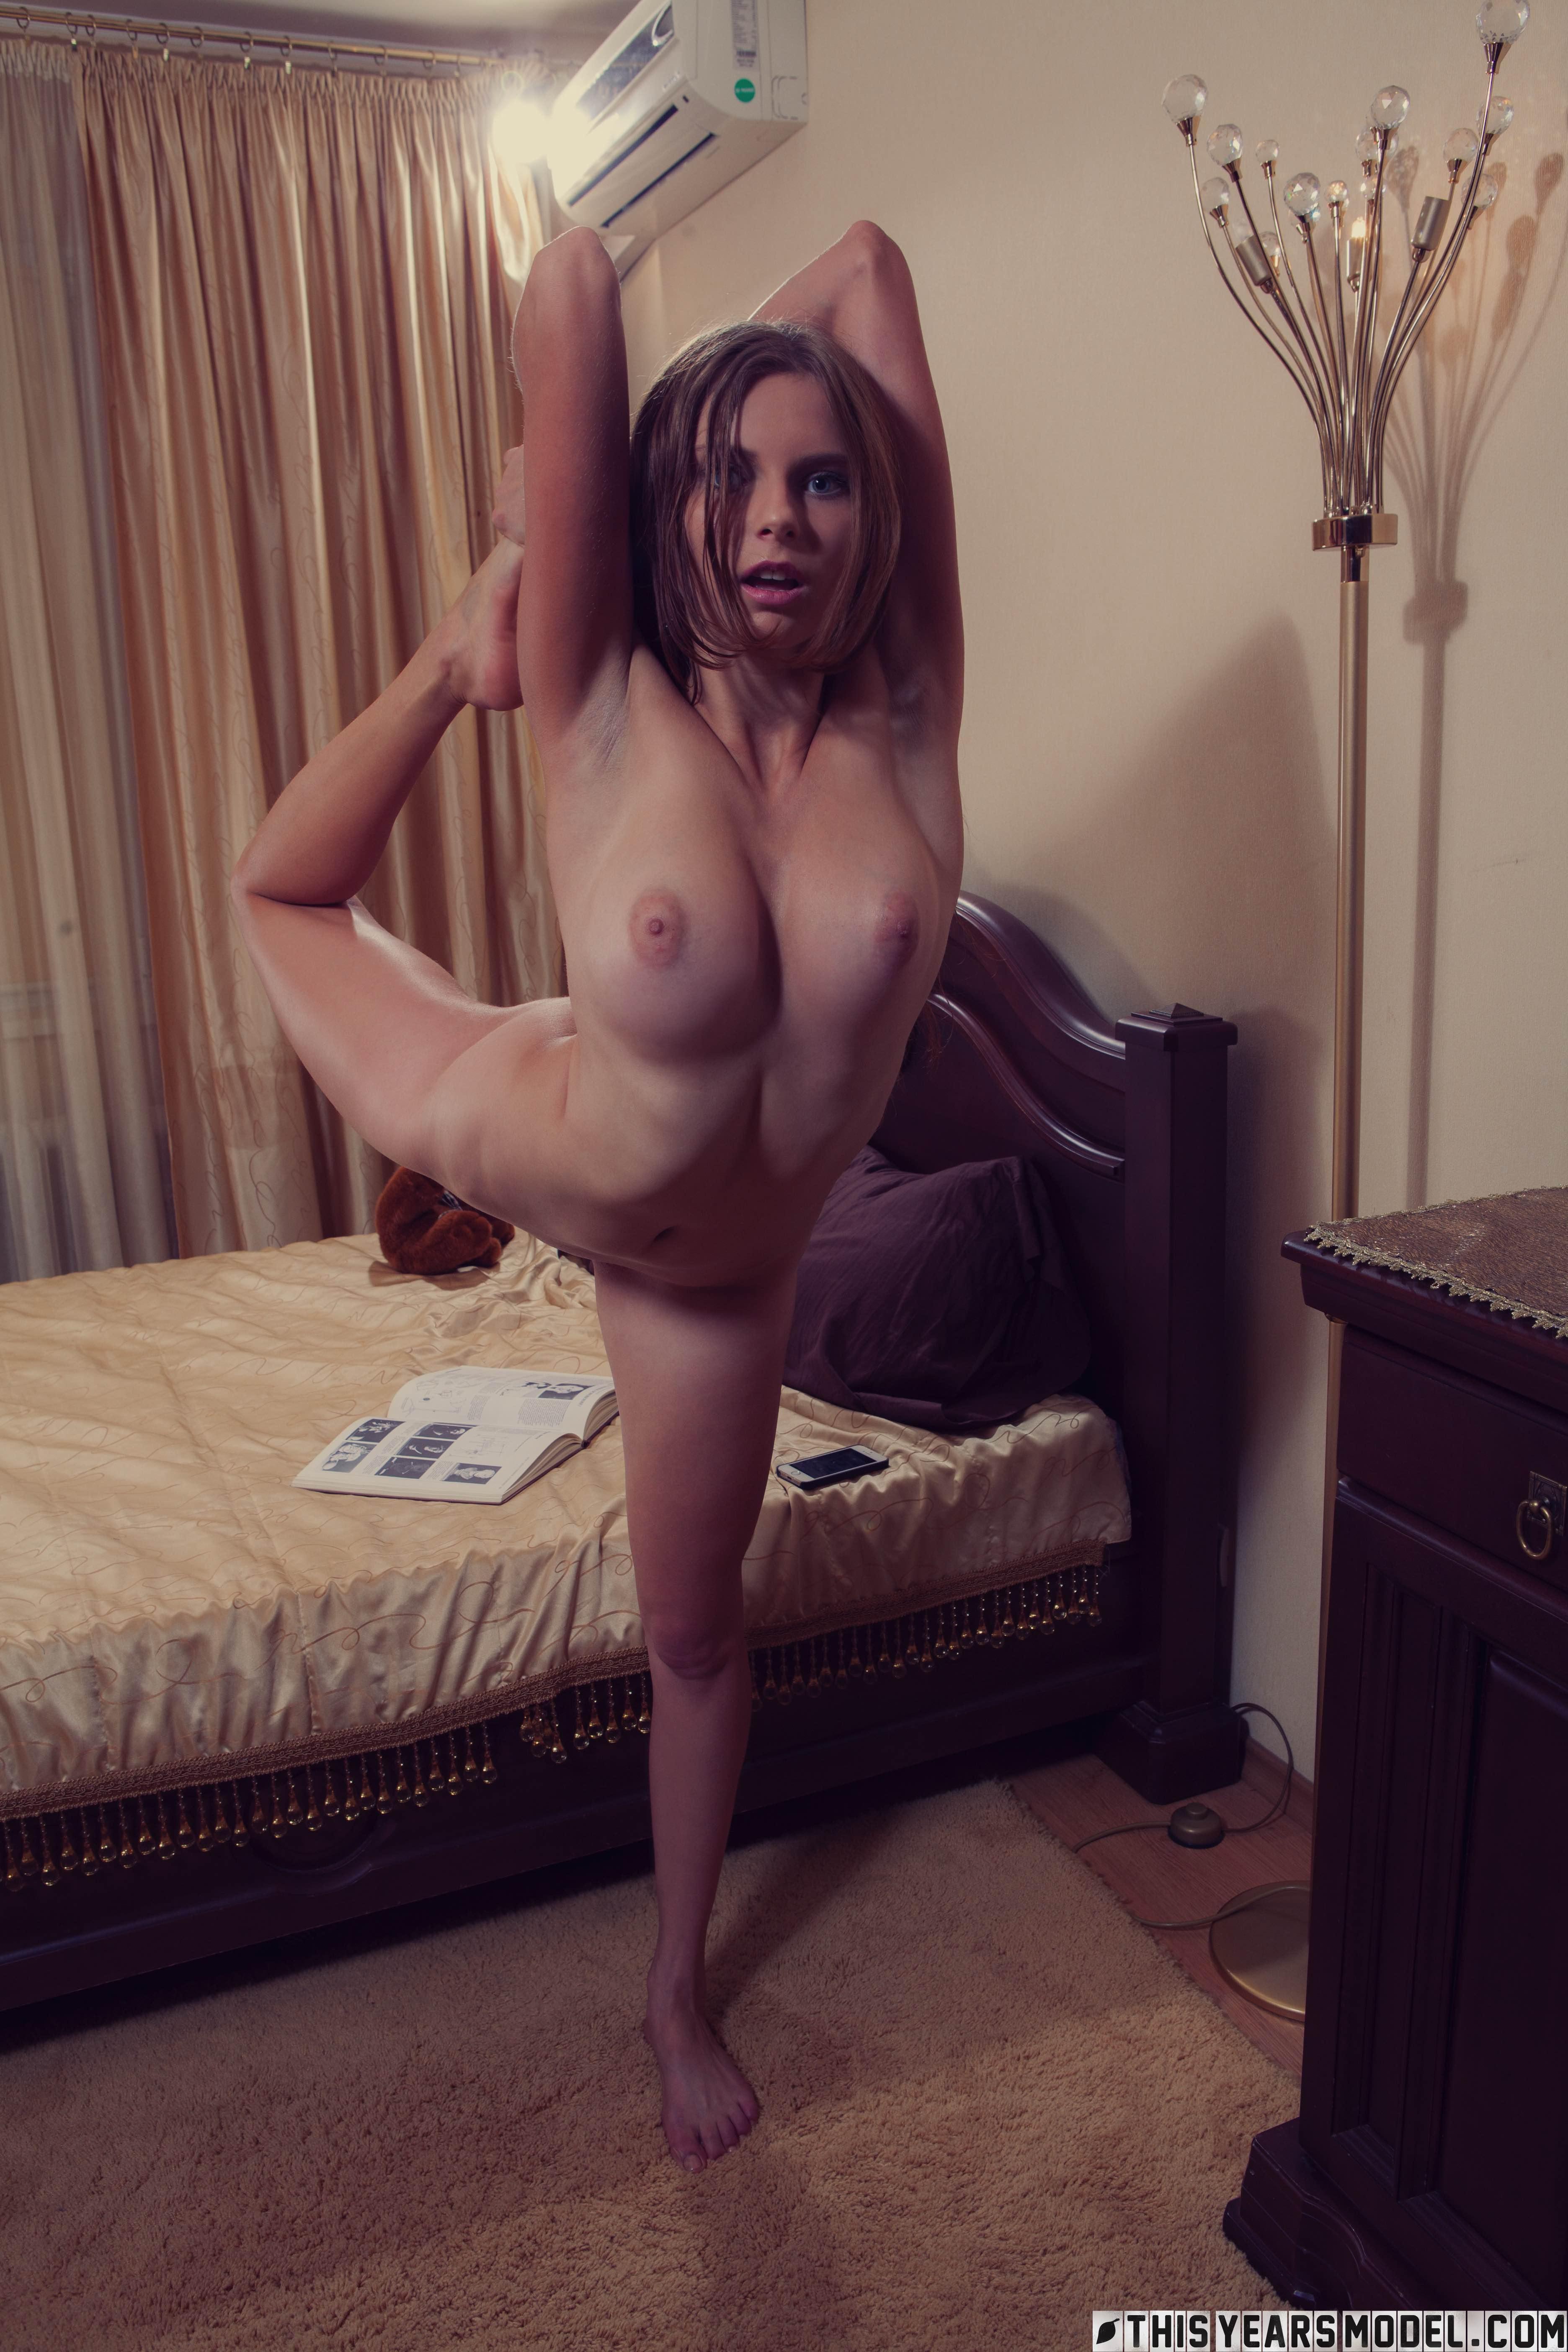 flexible-nude-girls-gymnast-splits-fetish-mix-vol2-14